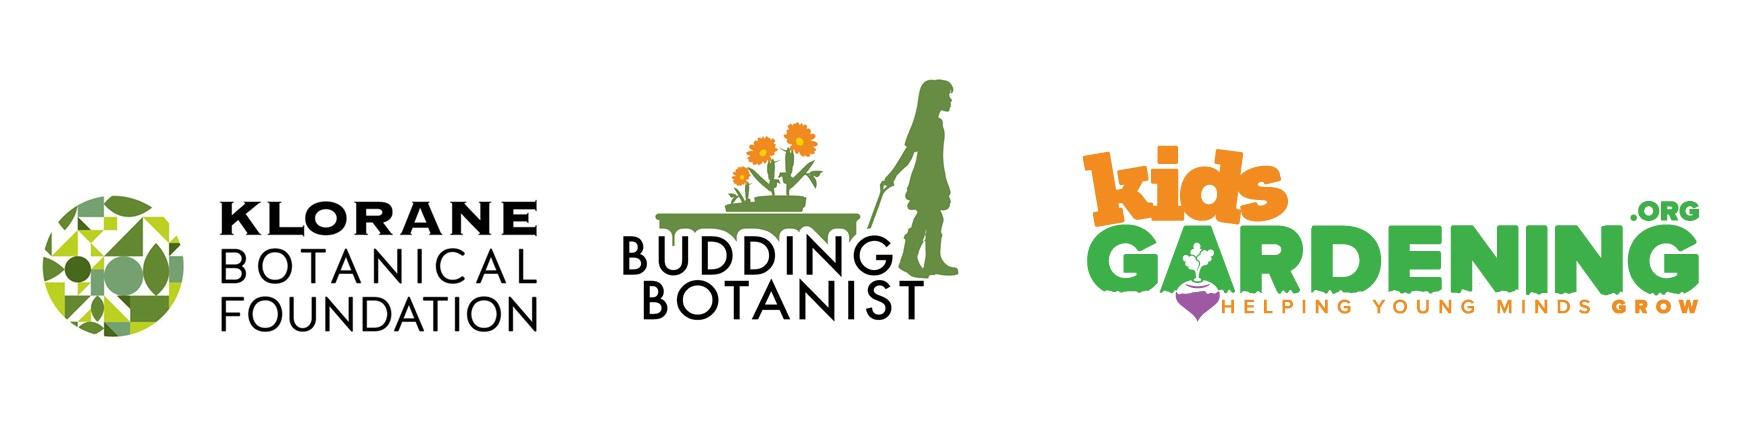 Chicago's Academy for Global Citizenship is a '18 Budding Botanist Grant Winner